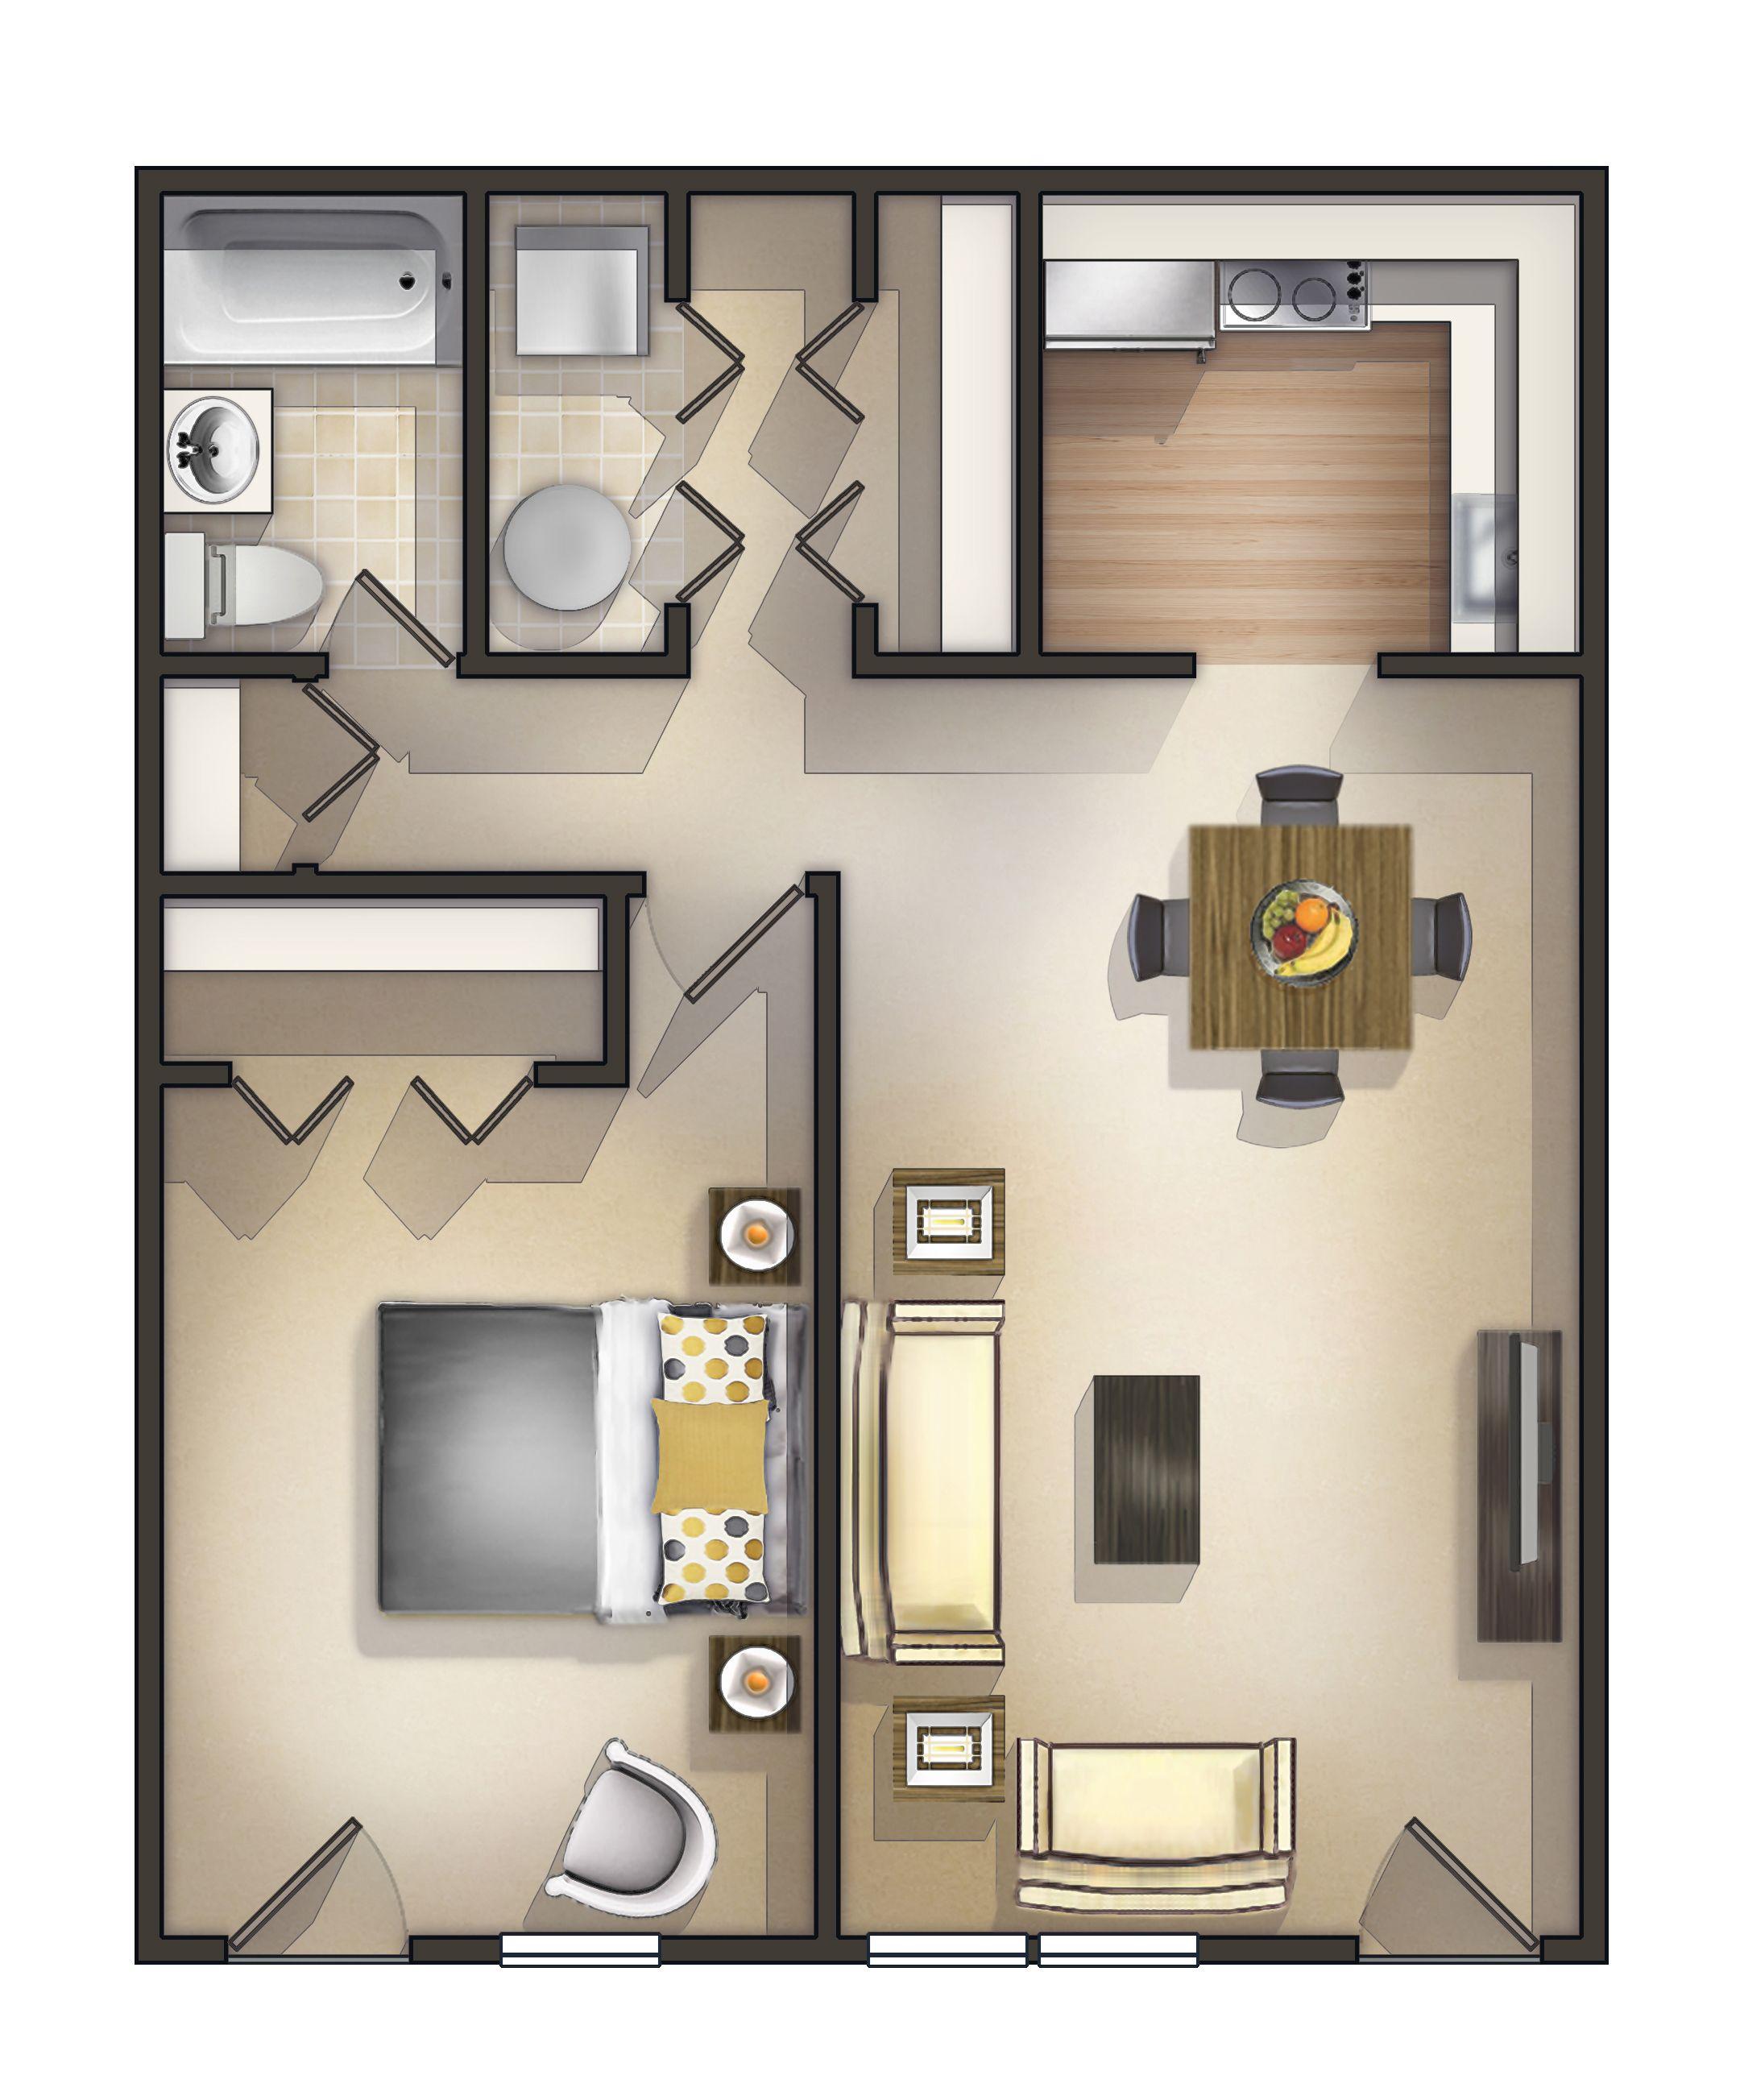 One Bedroom Rentals Near Me apartmentsforrent